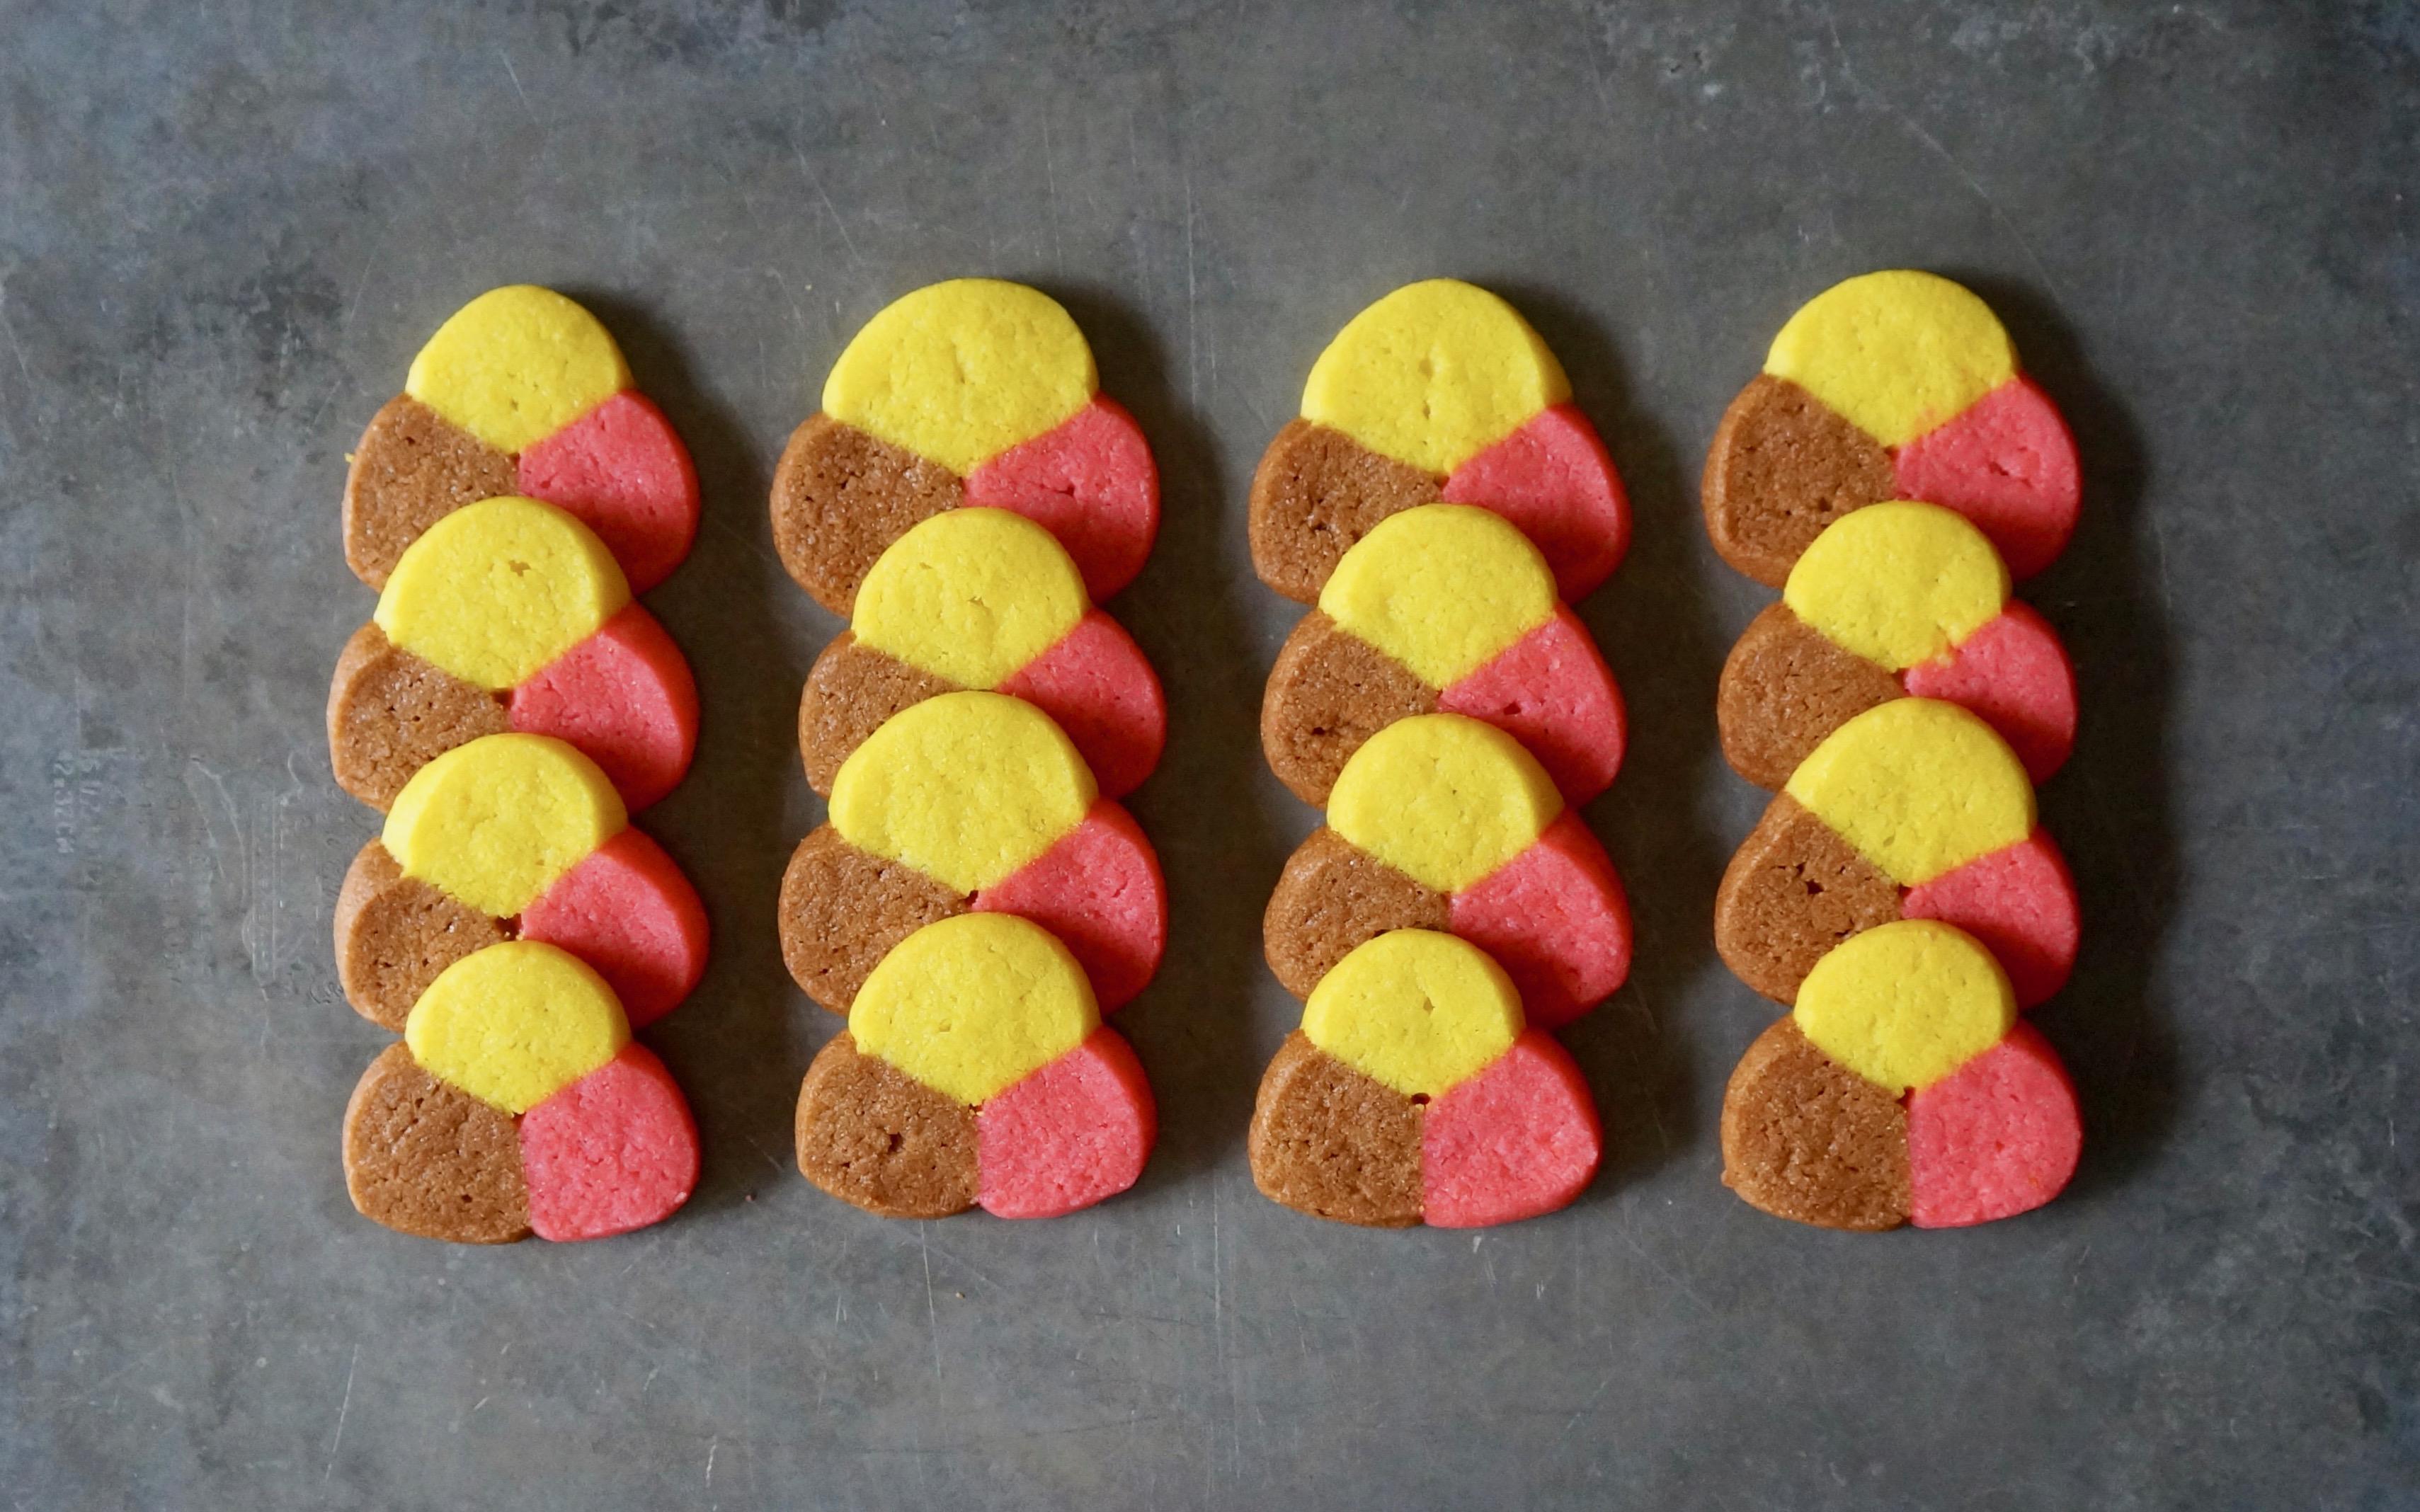 Tri-Color-Polvorones-Mexican-Cookies-Rebecca-Gordon-Cooking-Class-Buttermilk-Lipstick-Editor-In-Chief-Culinary-Entertaining-Techniques-RebeccaGordon-Pastry-Chef-Birmingham-Alabama-Southern-Hostess